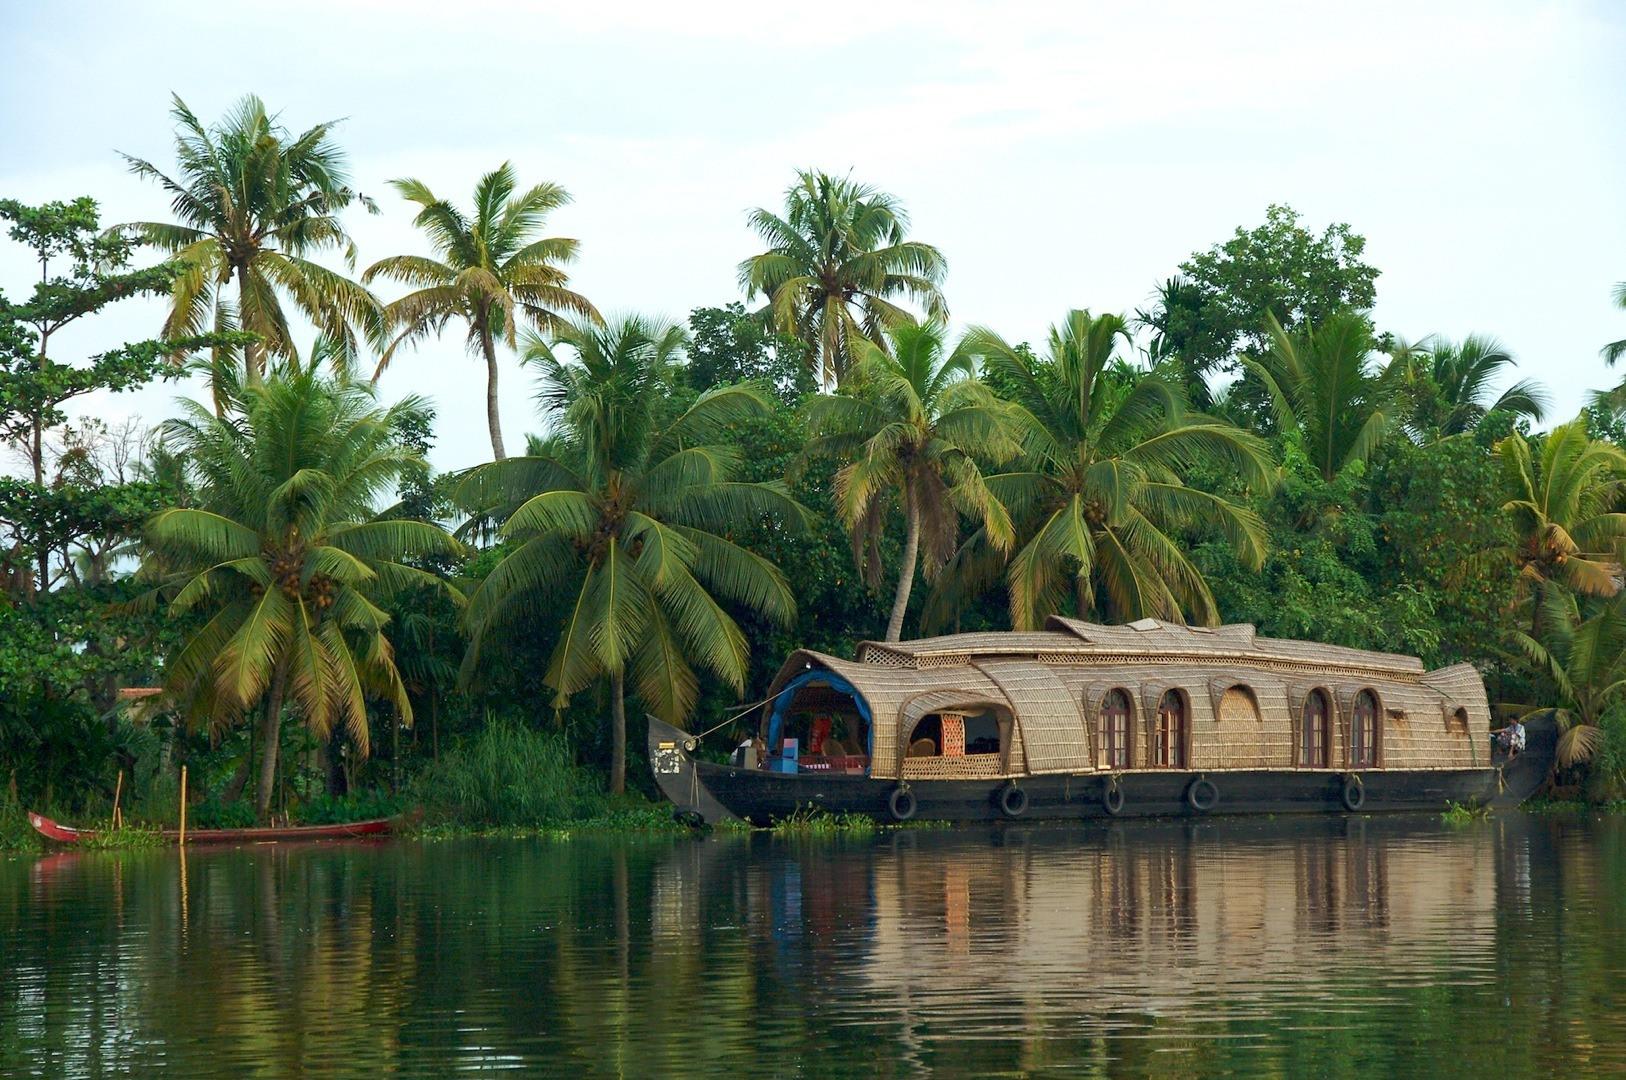 kerala tourism wallpapers hd